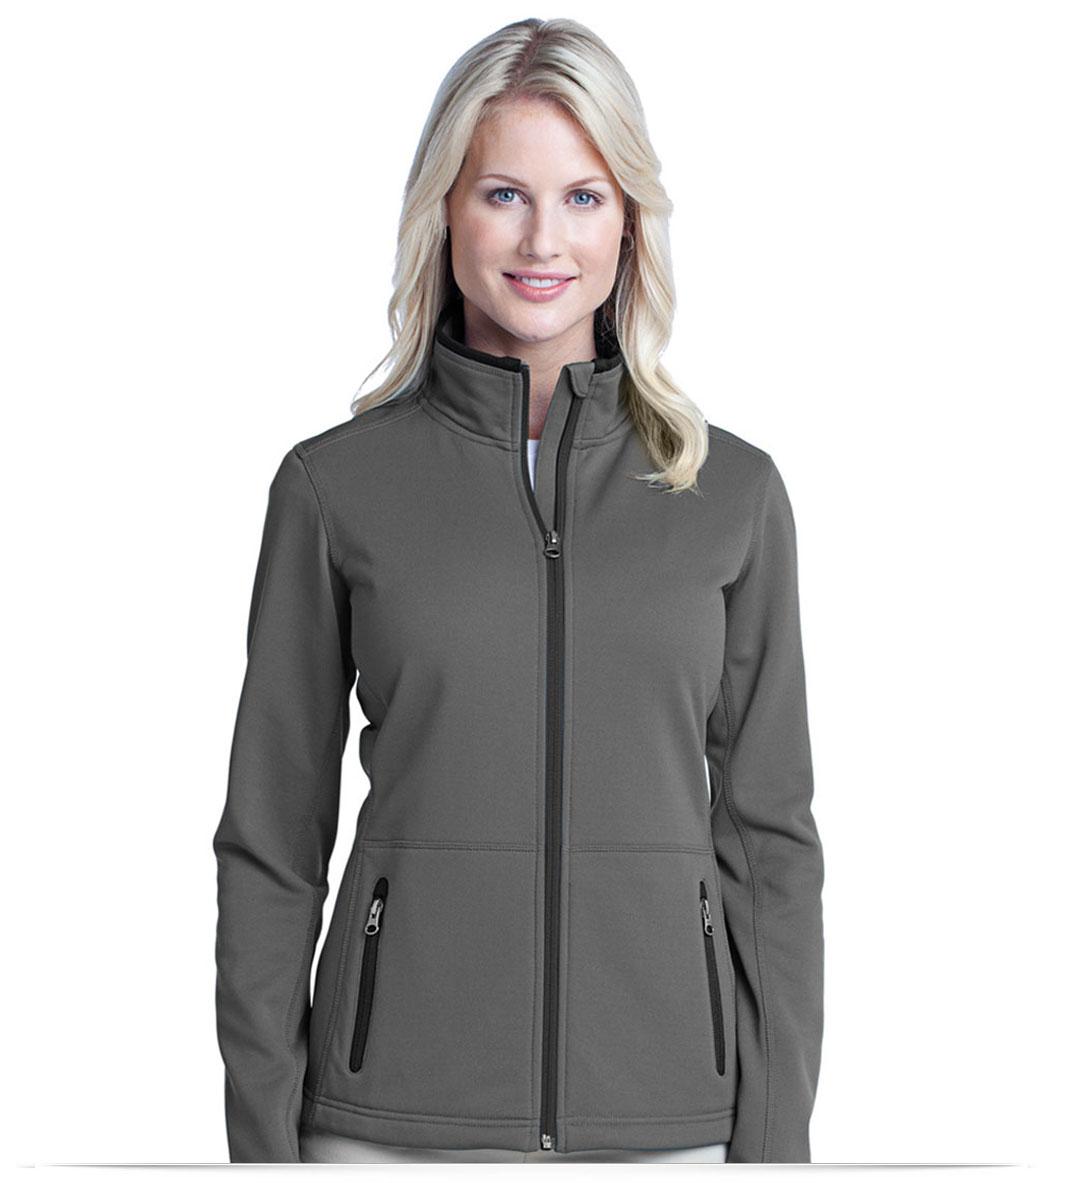 Personalized Port Authority Ladies Pique Fleece Jacket